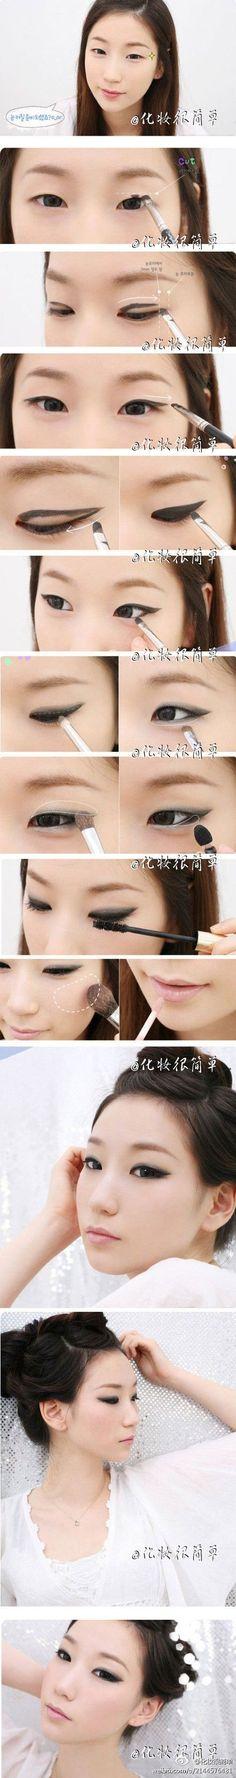 Asian makeup is so cute #everydayeyemakeup